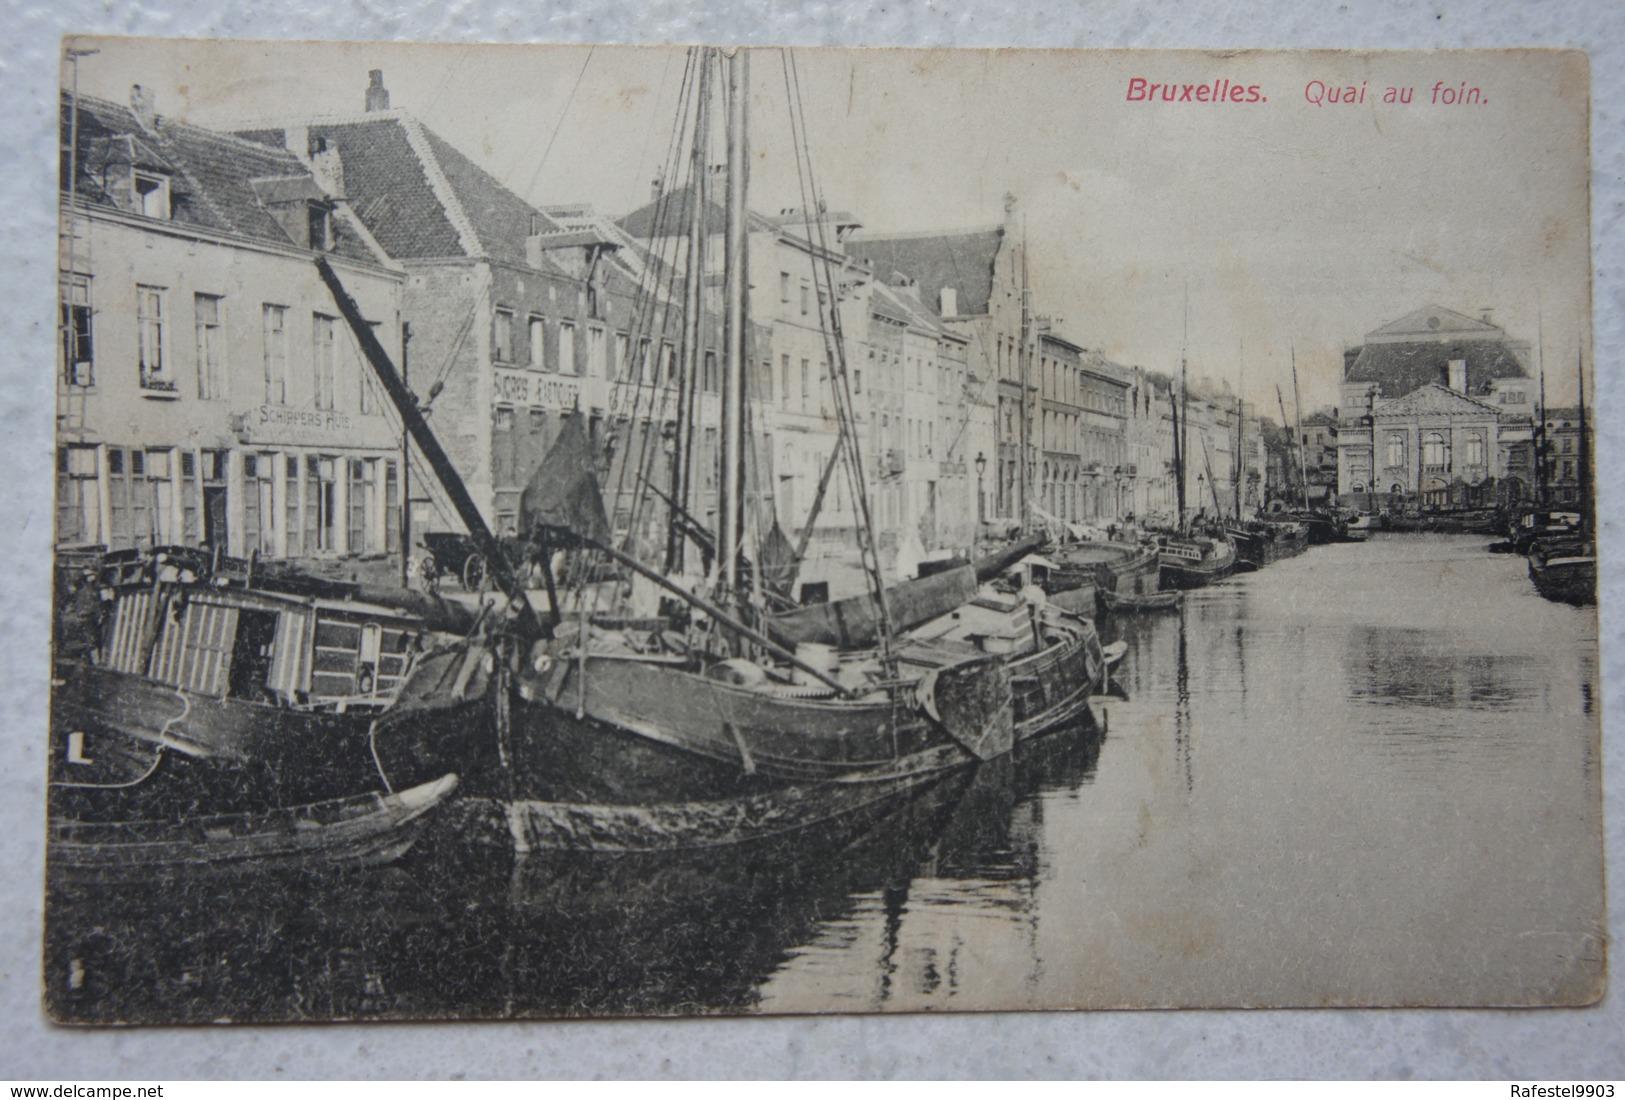 CPA BRUXELLES Brussel Canal Quai Au Foin Kanaal Péniche Peniche Barge Binnenscheepvaart - Non Classificati